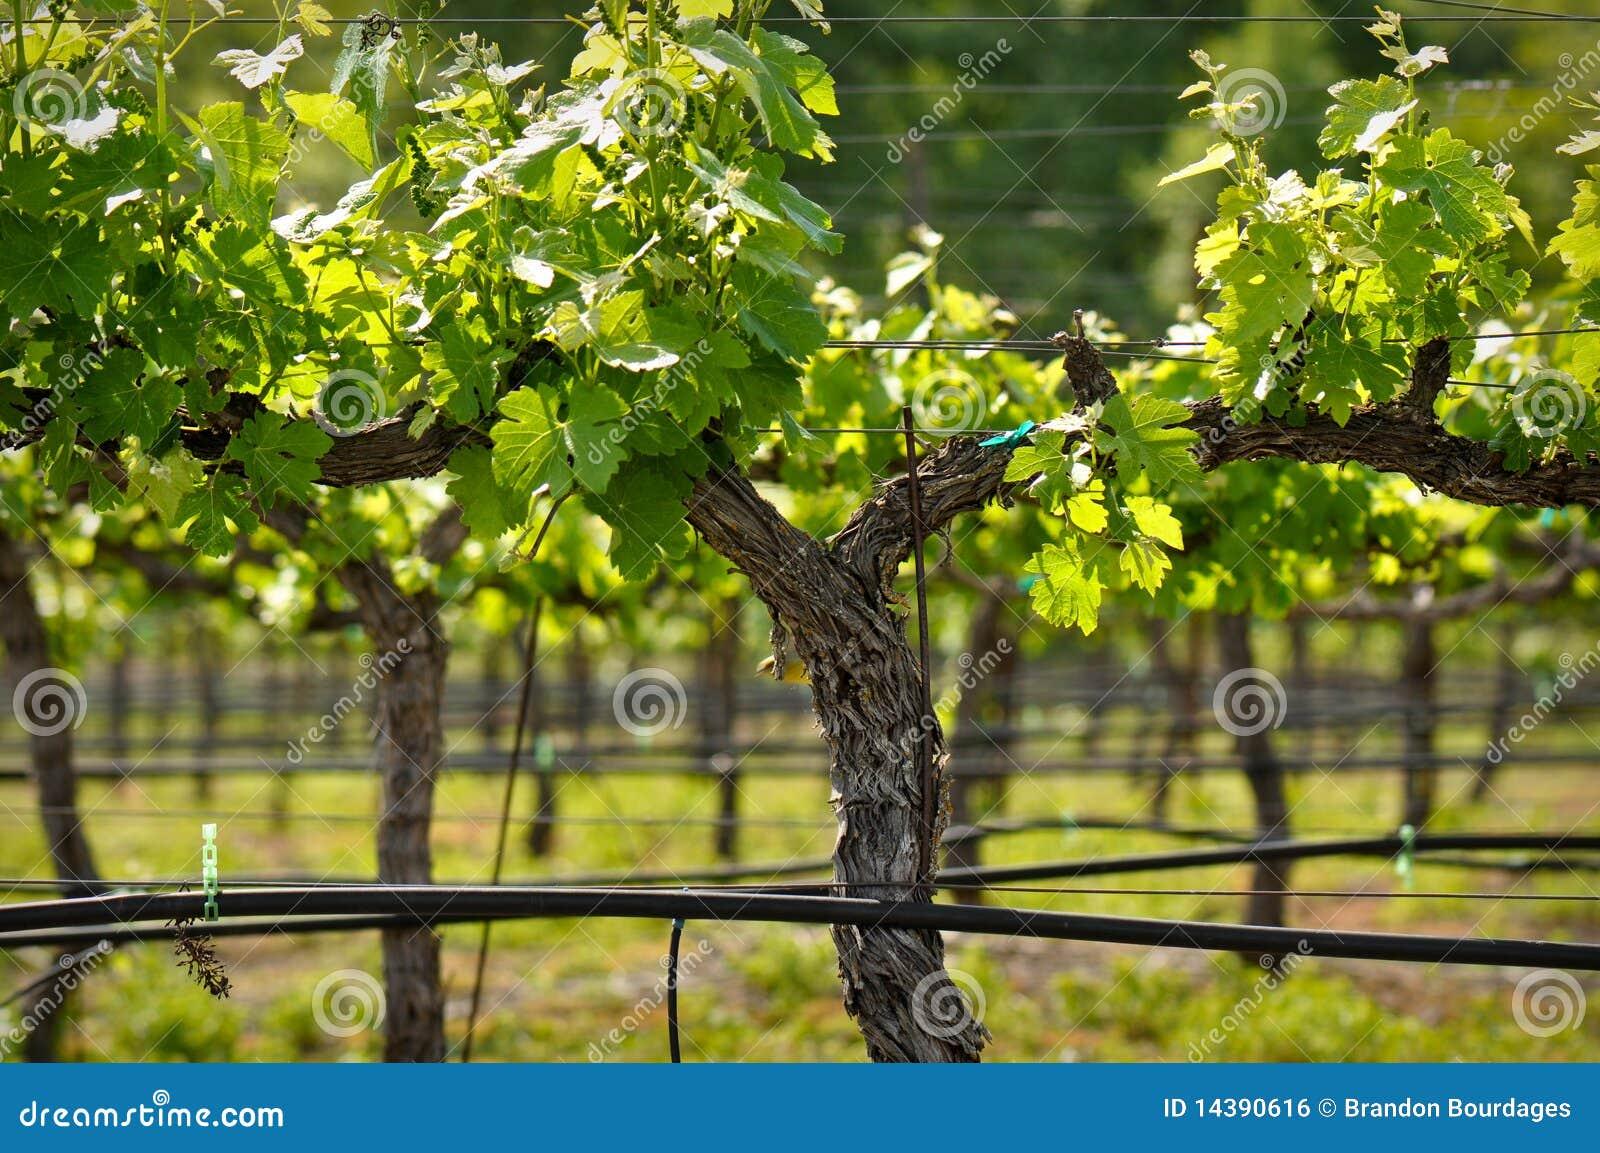 napa valley grapevine closeup royalty free stock image grape vine clipart free grape vine clip art png